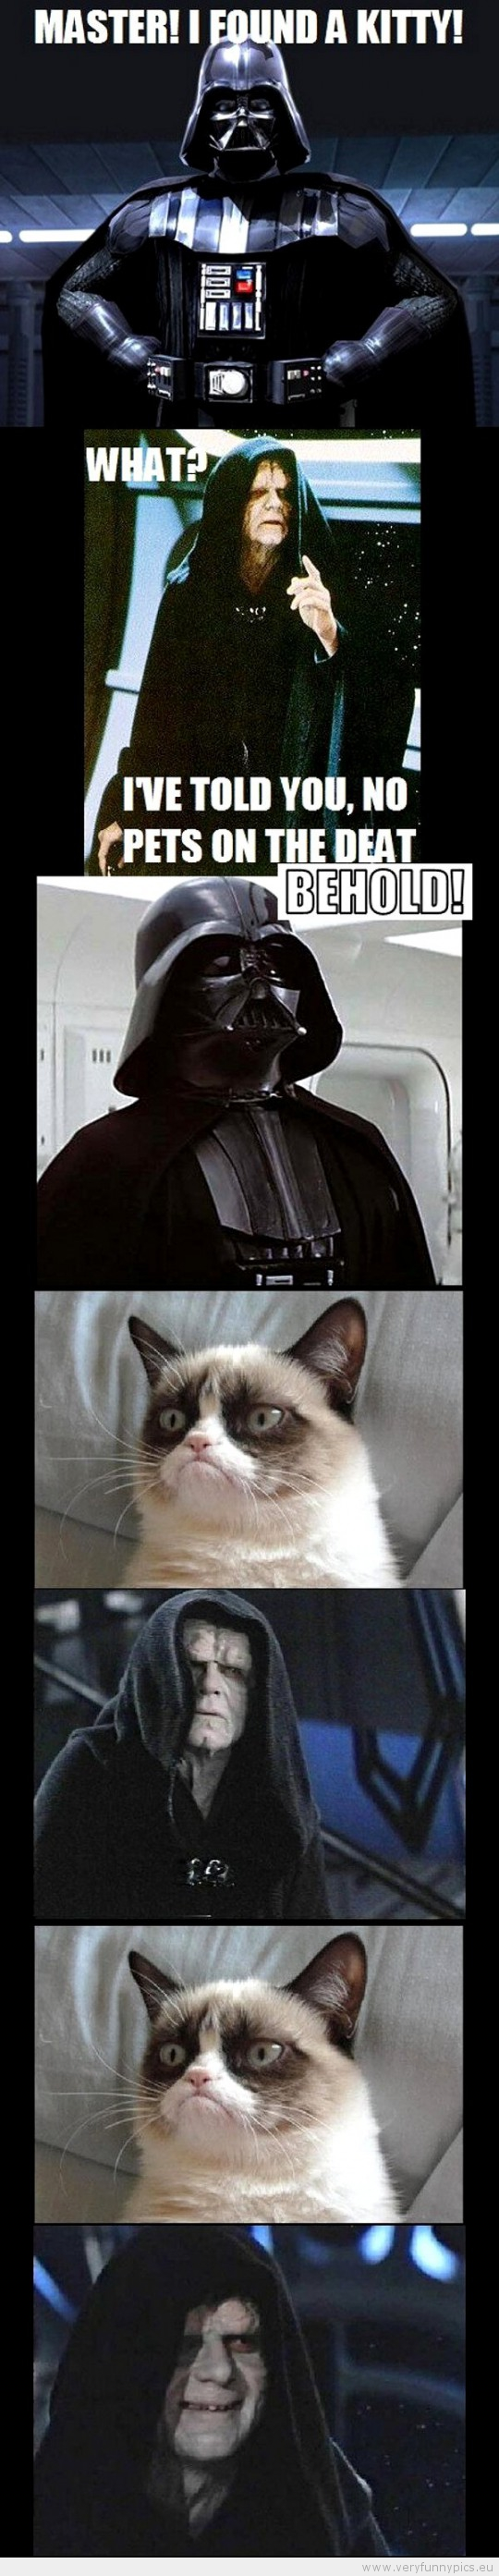 Funny Picture - Grumpy cat star wars